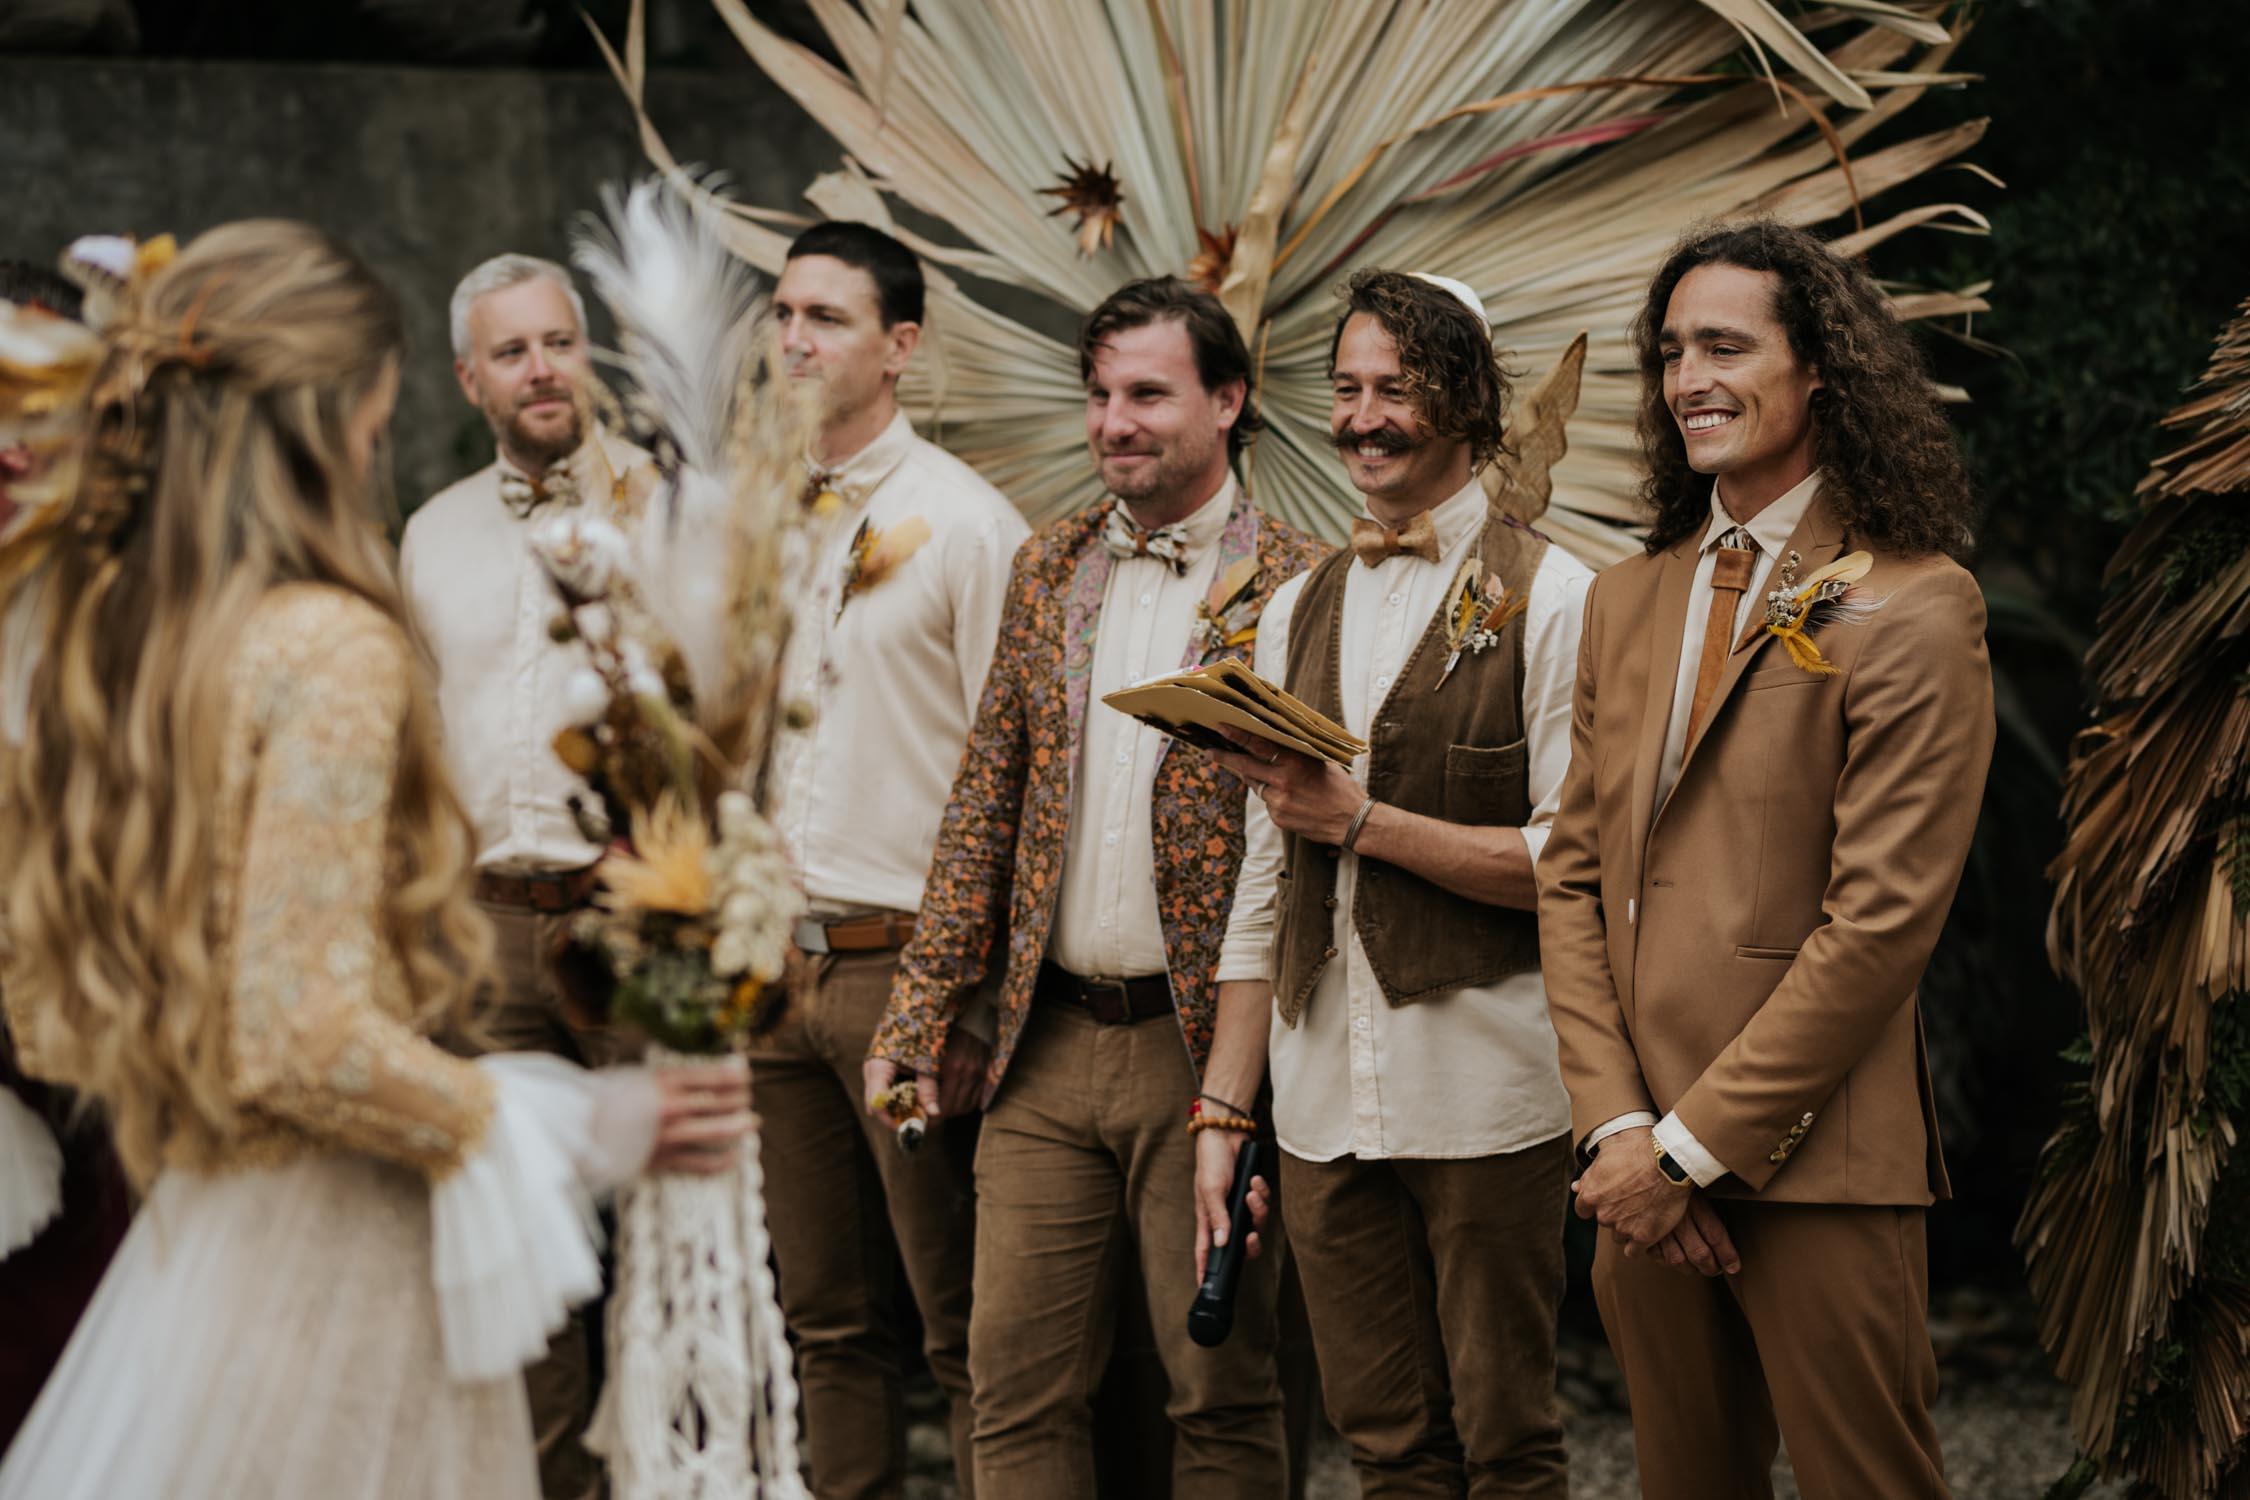 Groom wearing brown suite, beige shirt, brown Nguni cowhide tie, felt hat and foraged dried flowers and feather boutineer watches bride walk down aisle